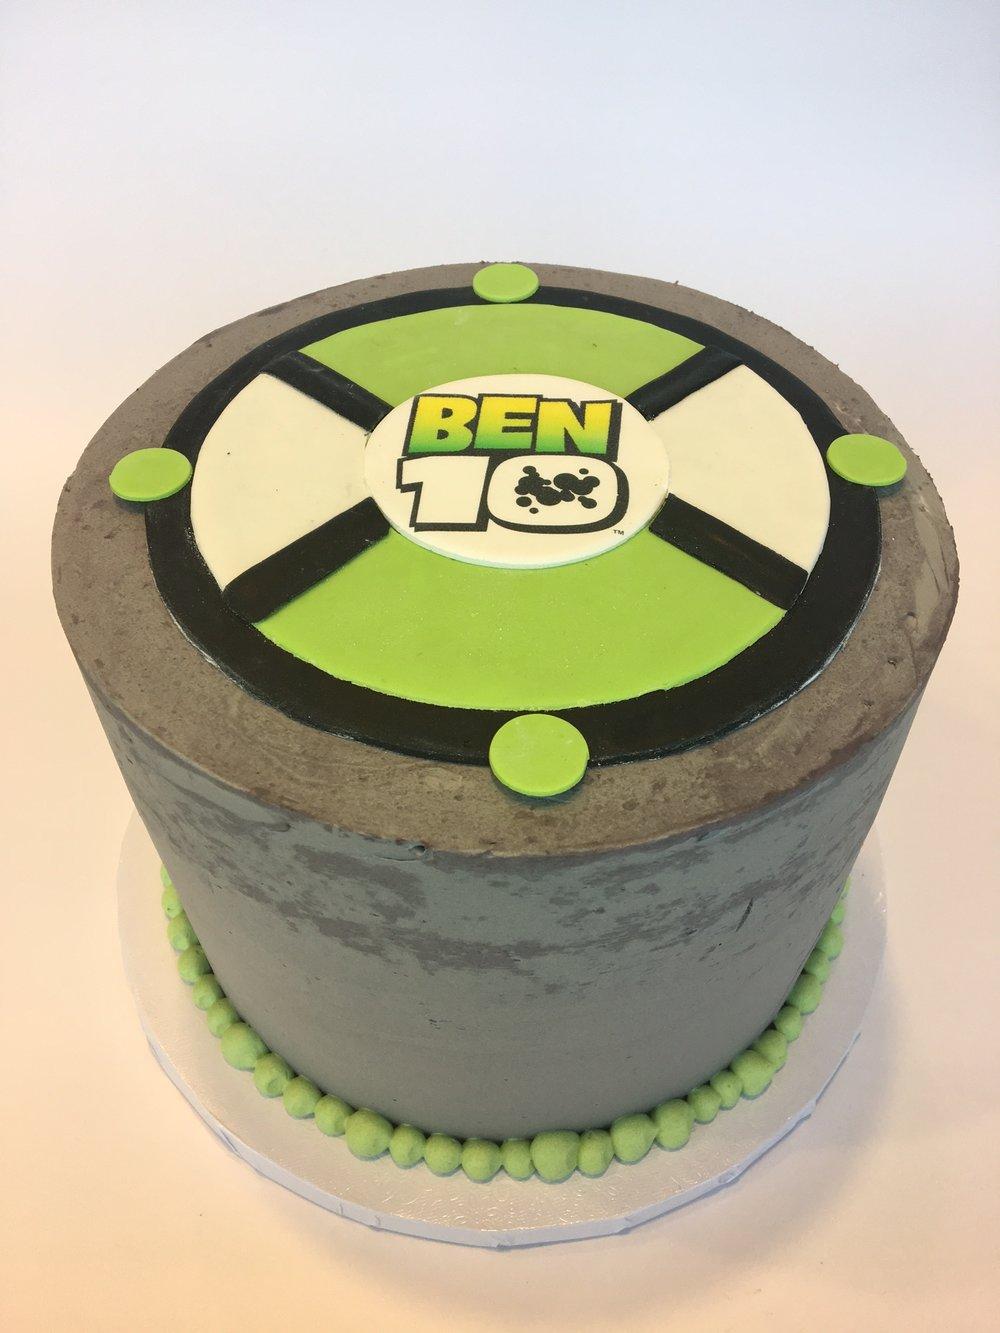 Ben 10 Cake.jpg